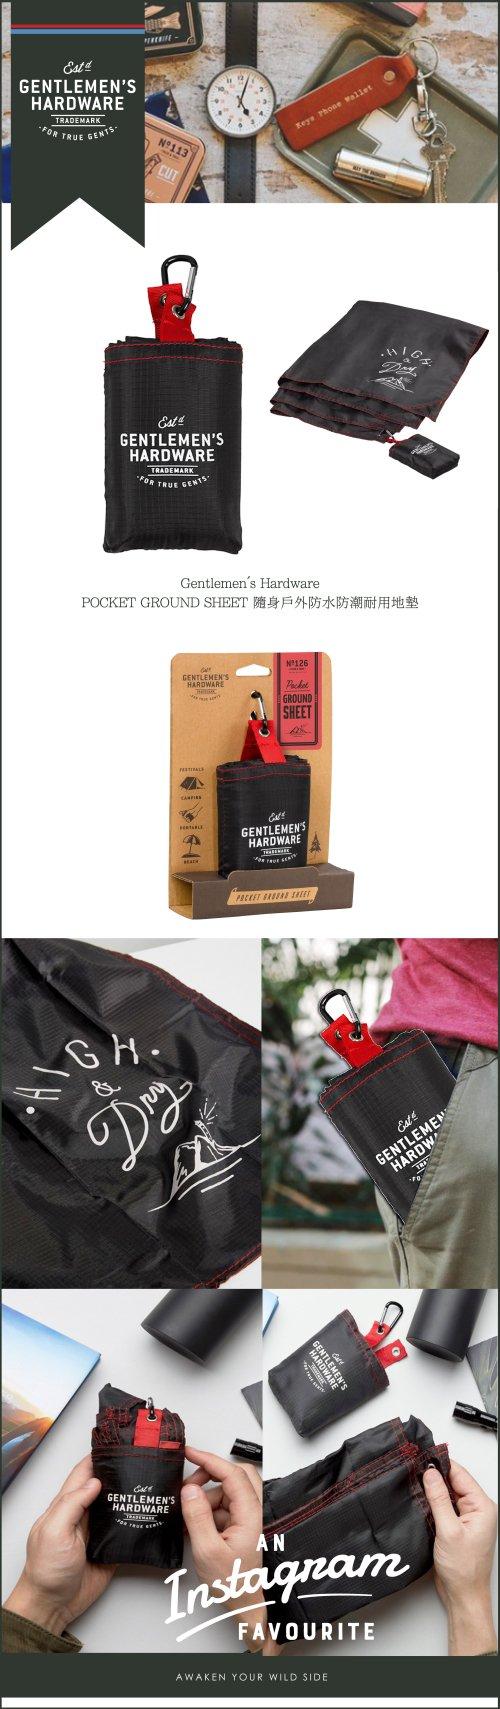 Gentlemen's Hardware|戶外野餐組合:防水防潮地墊+多功能點心收納盒(銀)